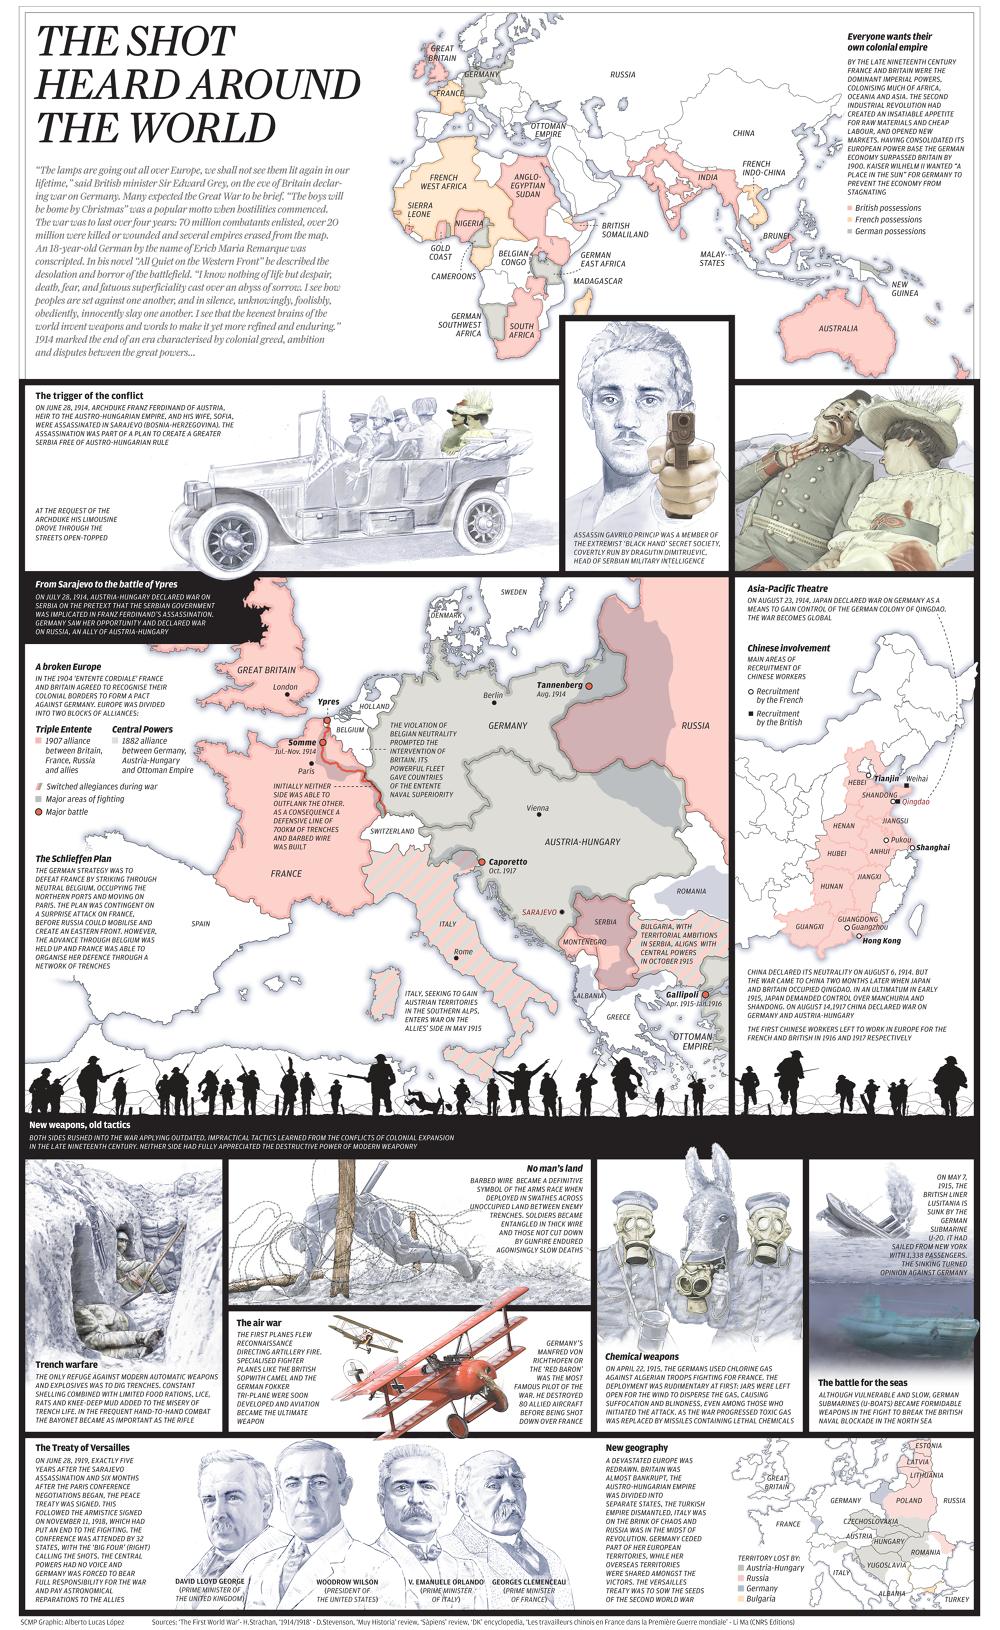 #INFOGRAPHIC. Centenary infographic on the First World War -- Infografía en el centenario de la Gran Guerra #SCMP